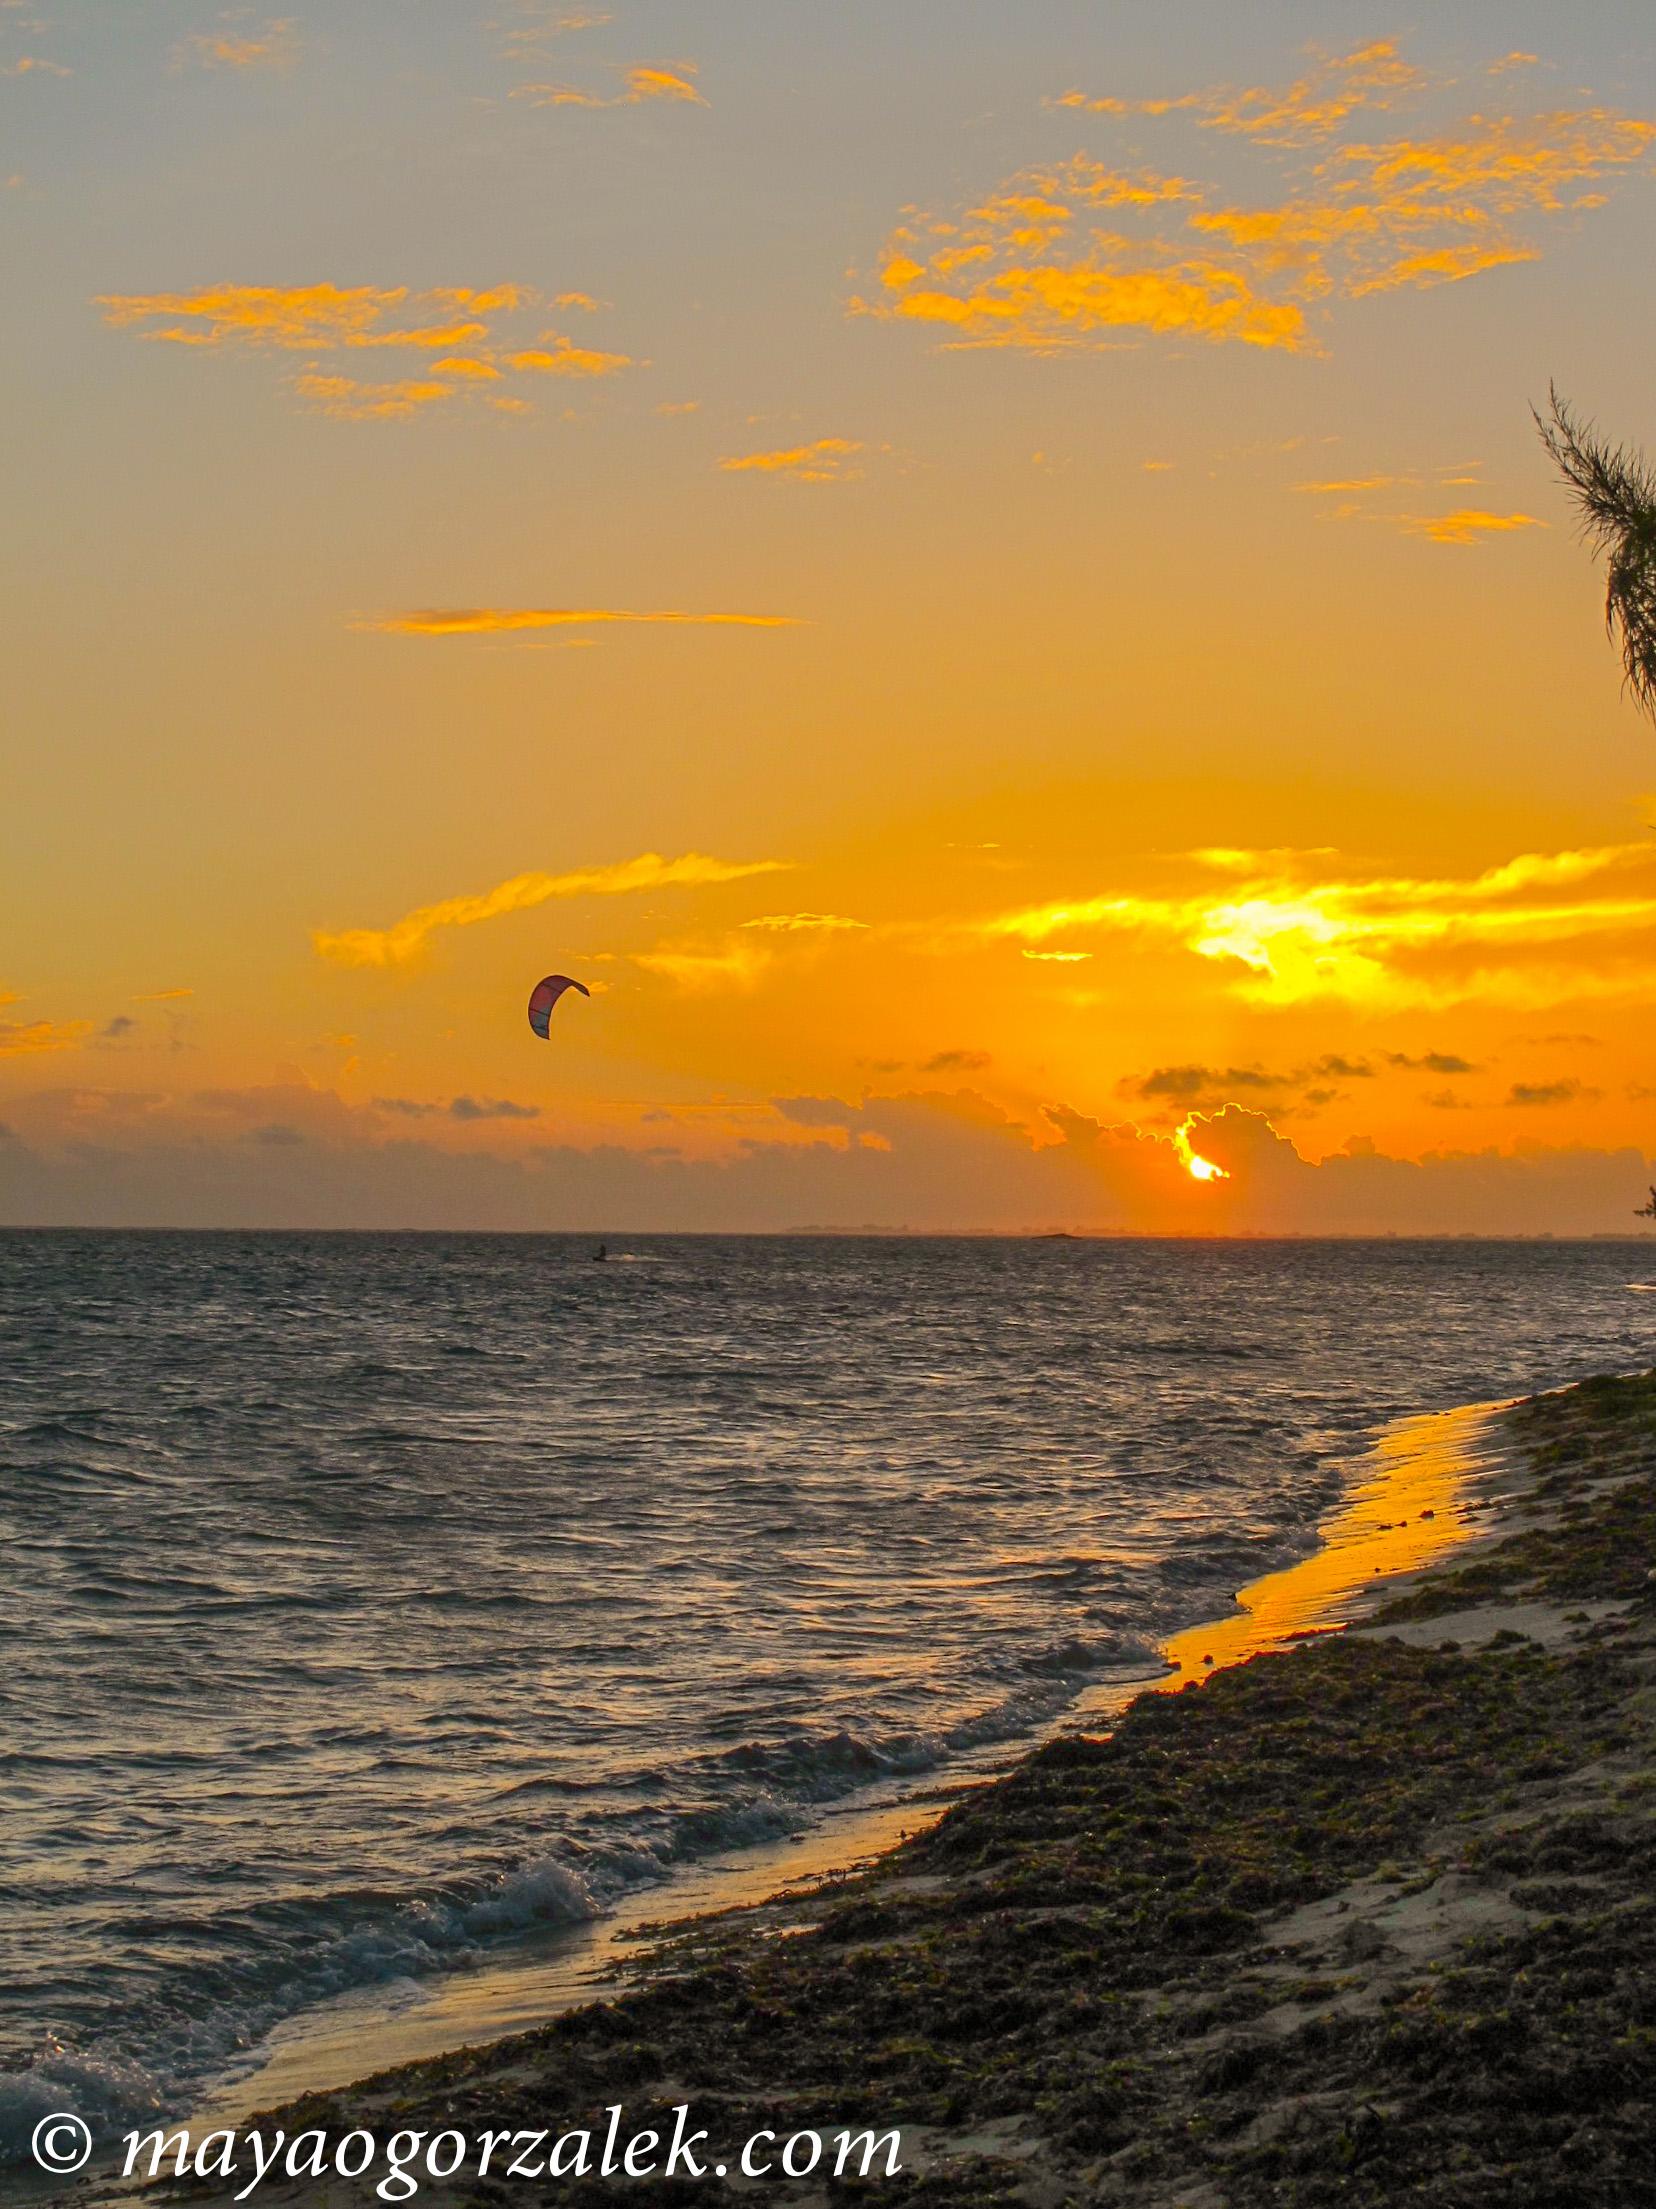 sunset kite